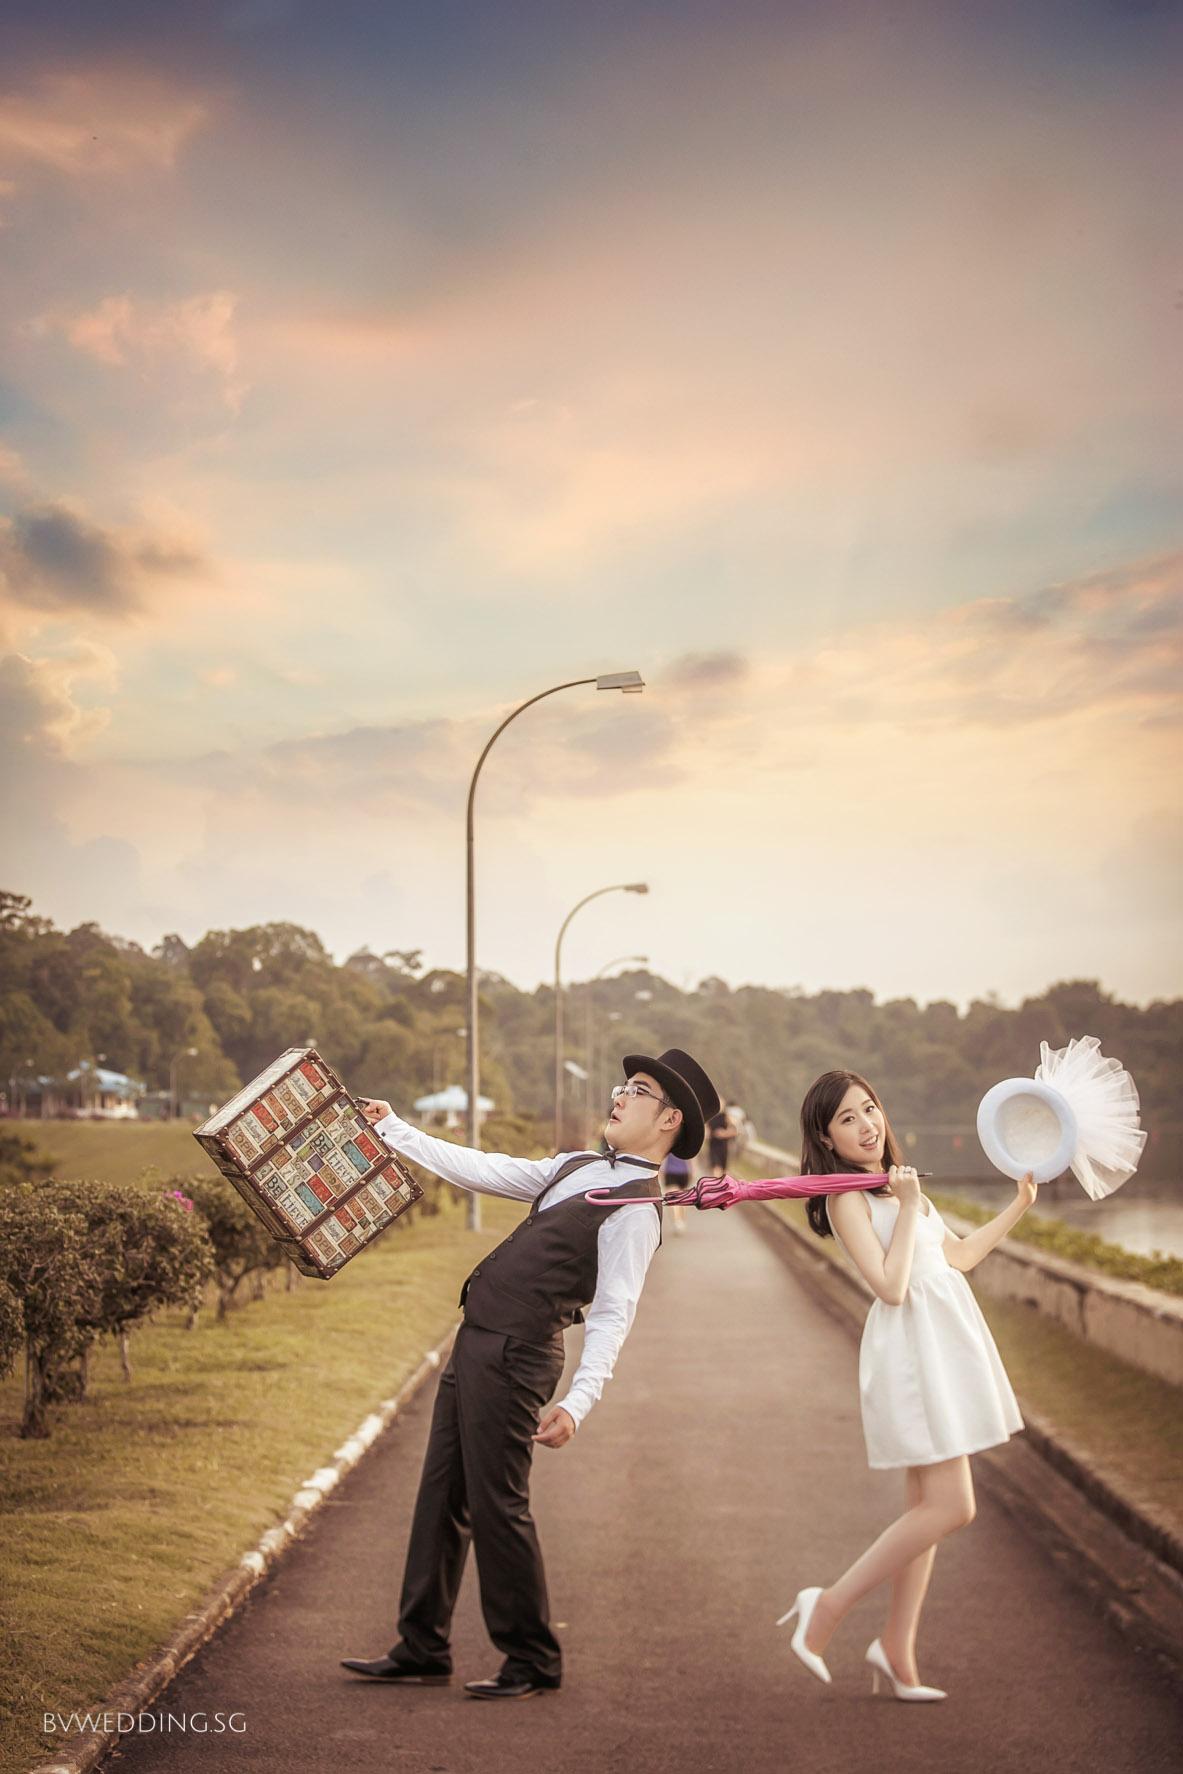 Casual Photoshoot at Upper Seletar